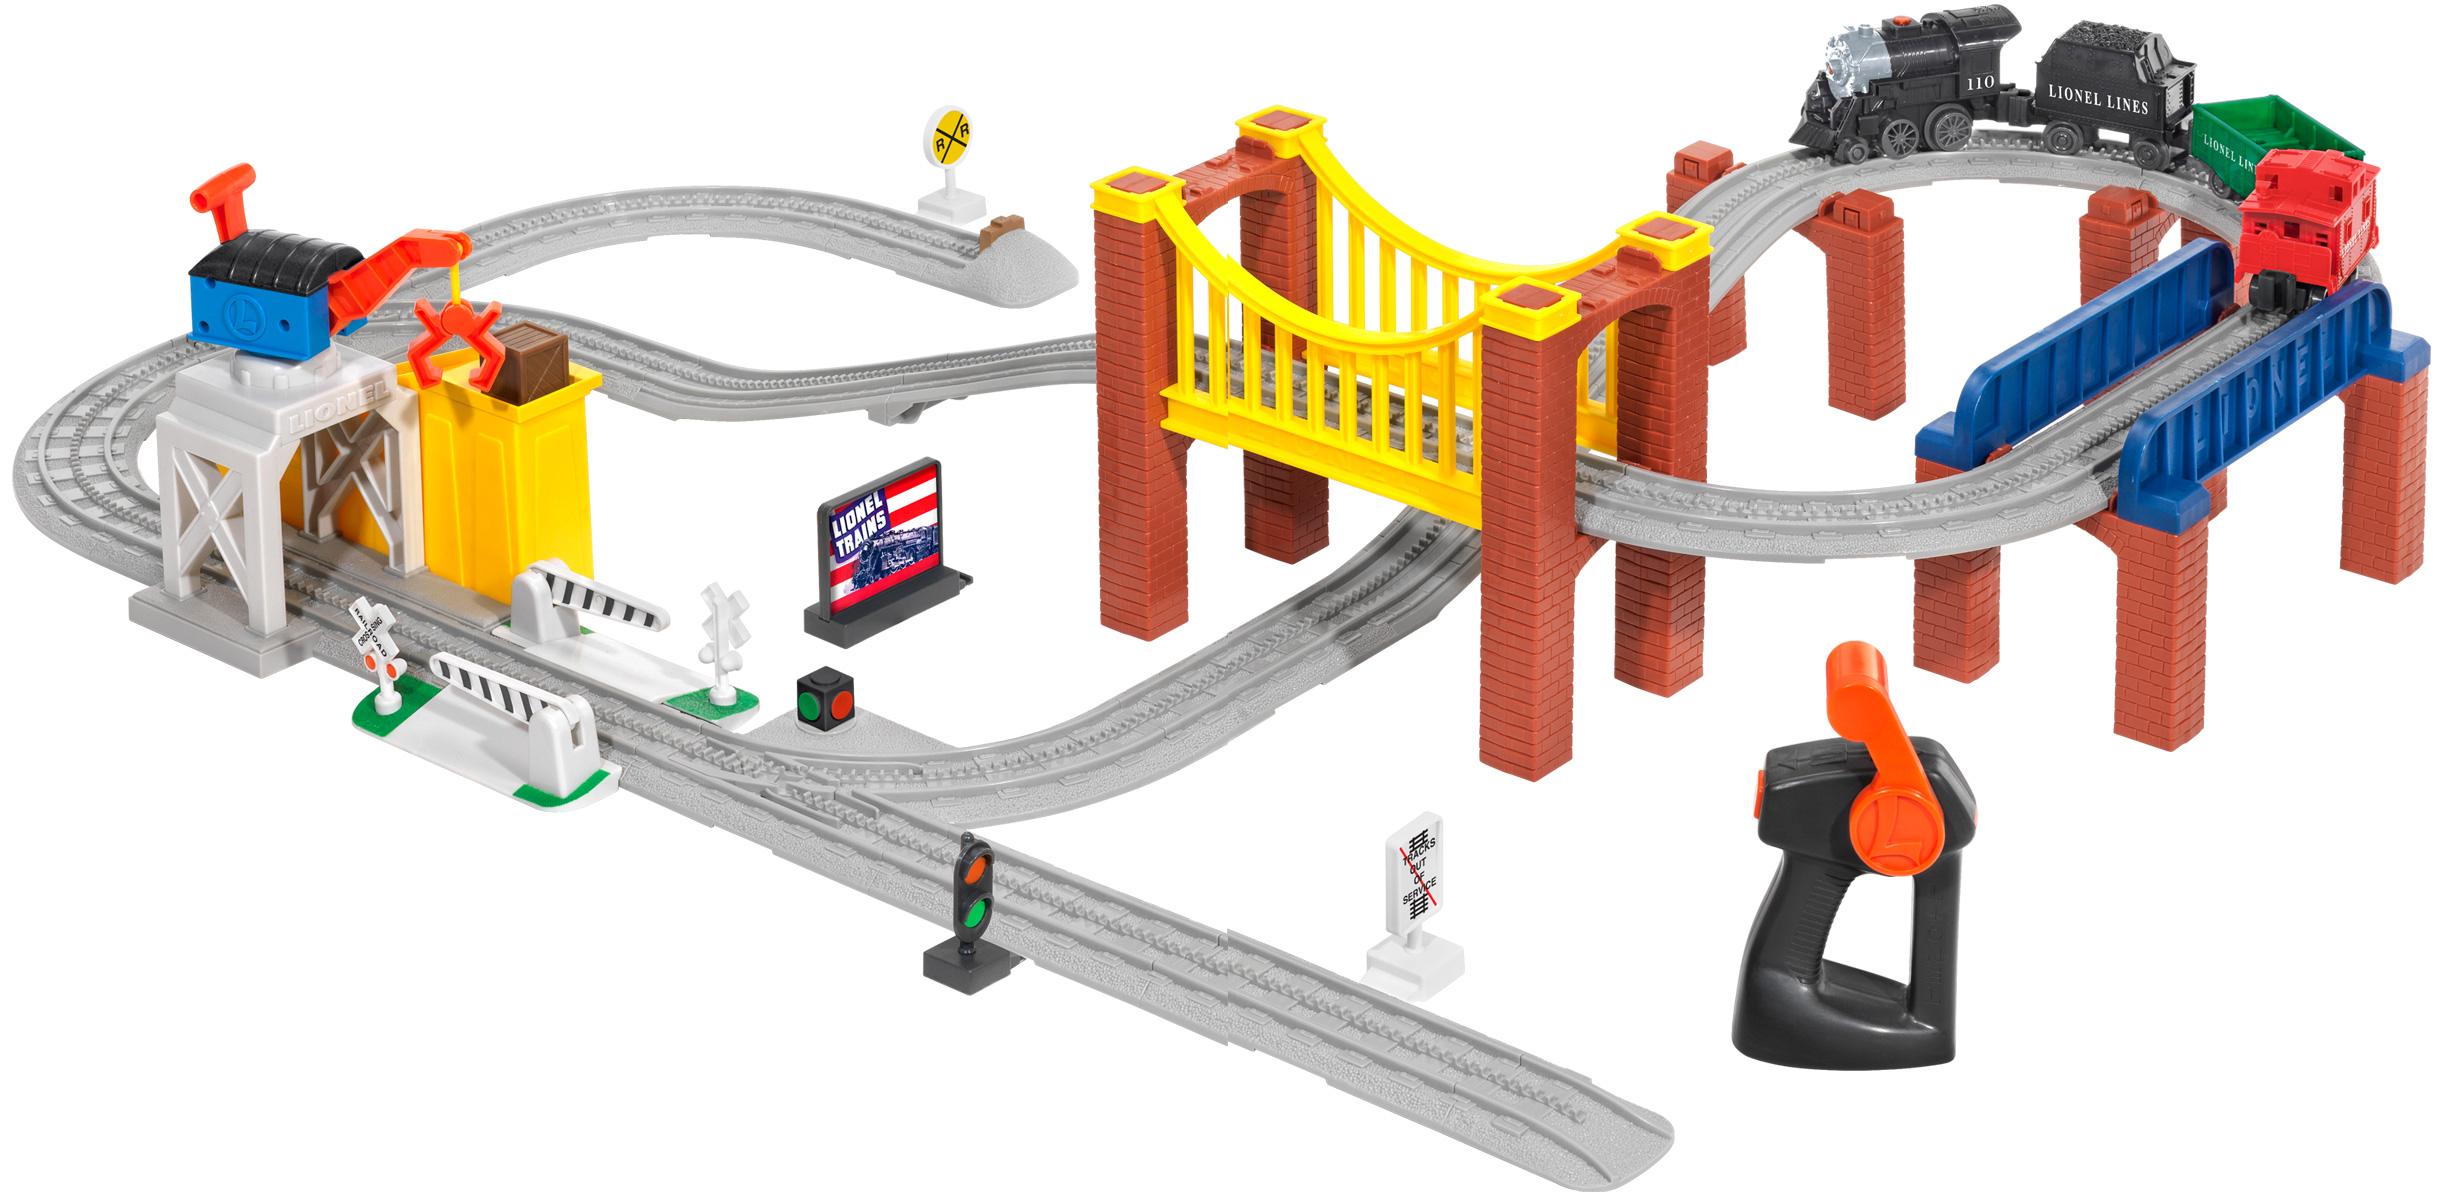 Lionel trains value 027